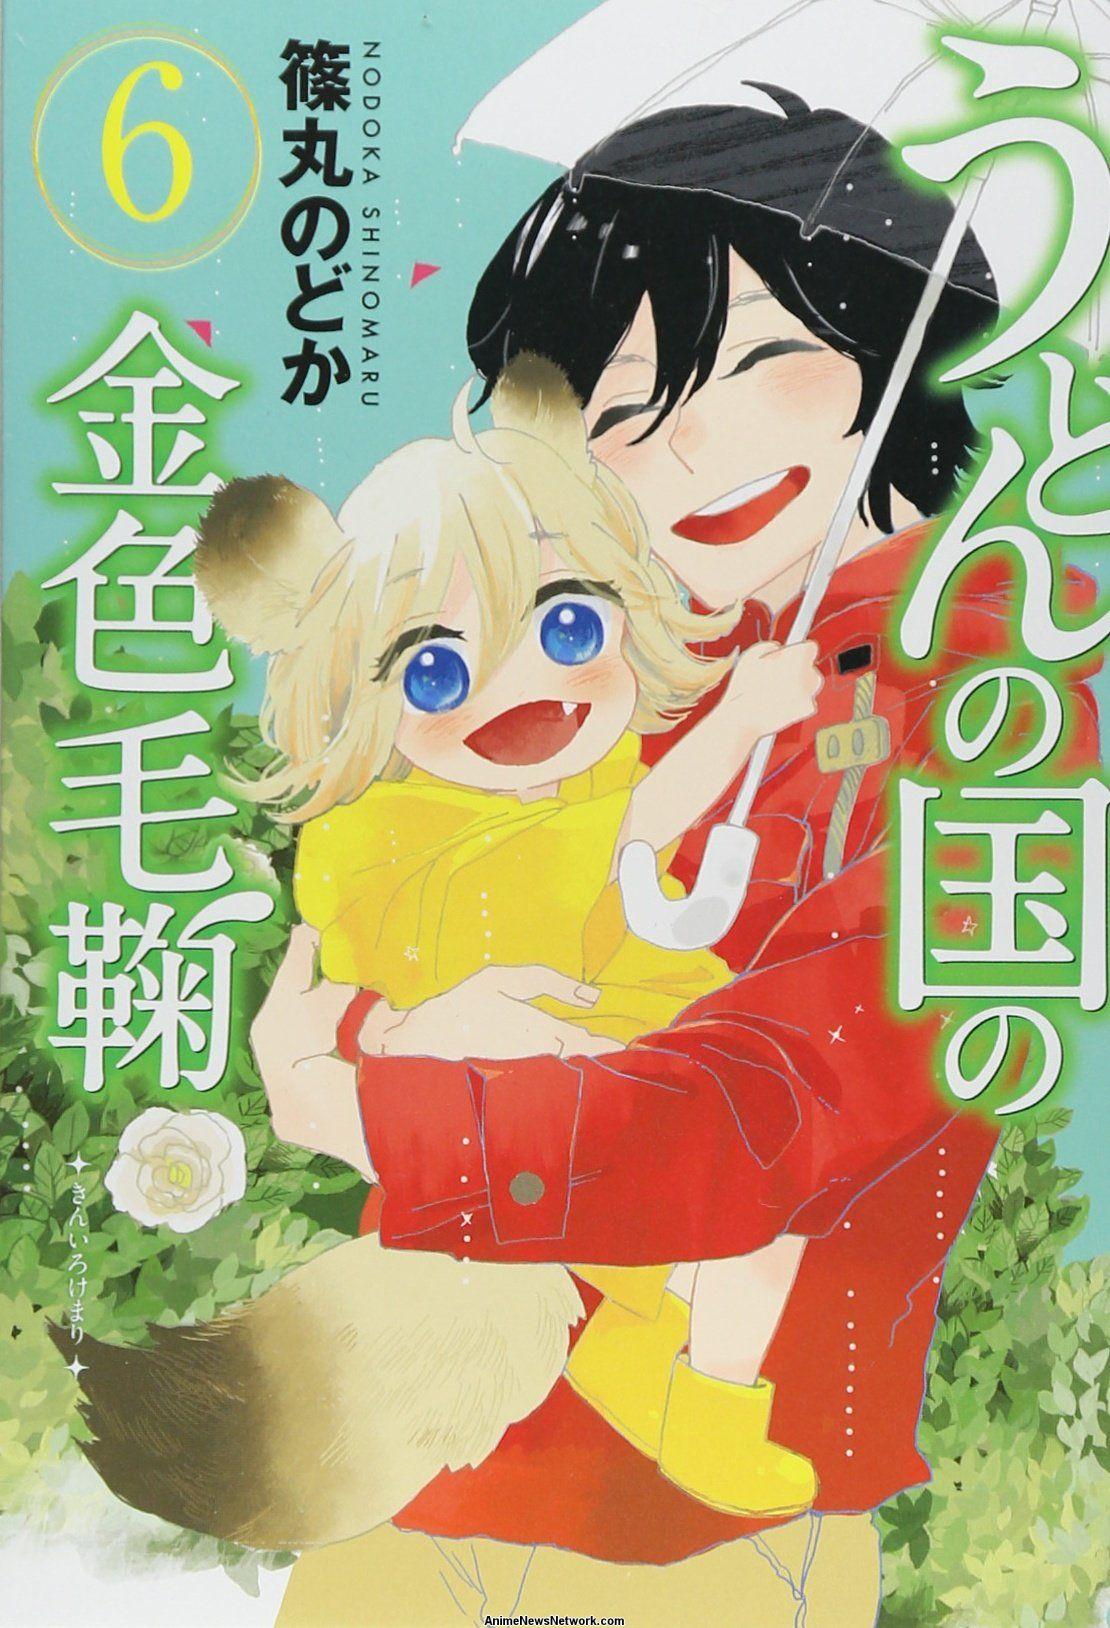 udon no kuni no kiniro kemari manga gets tv anime this year - news